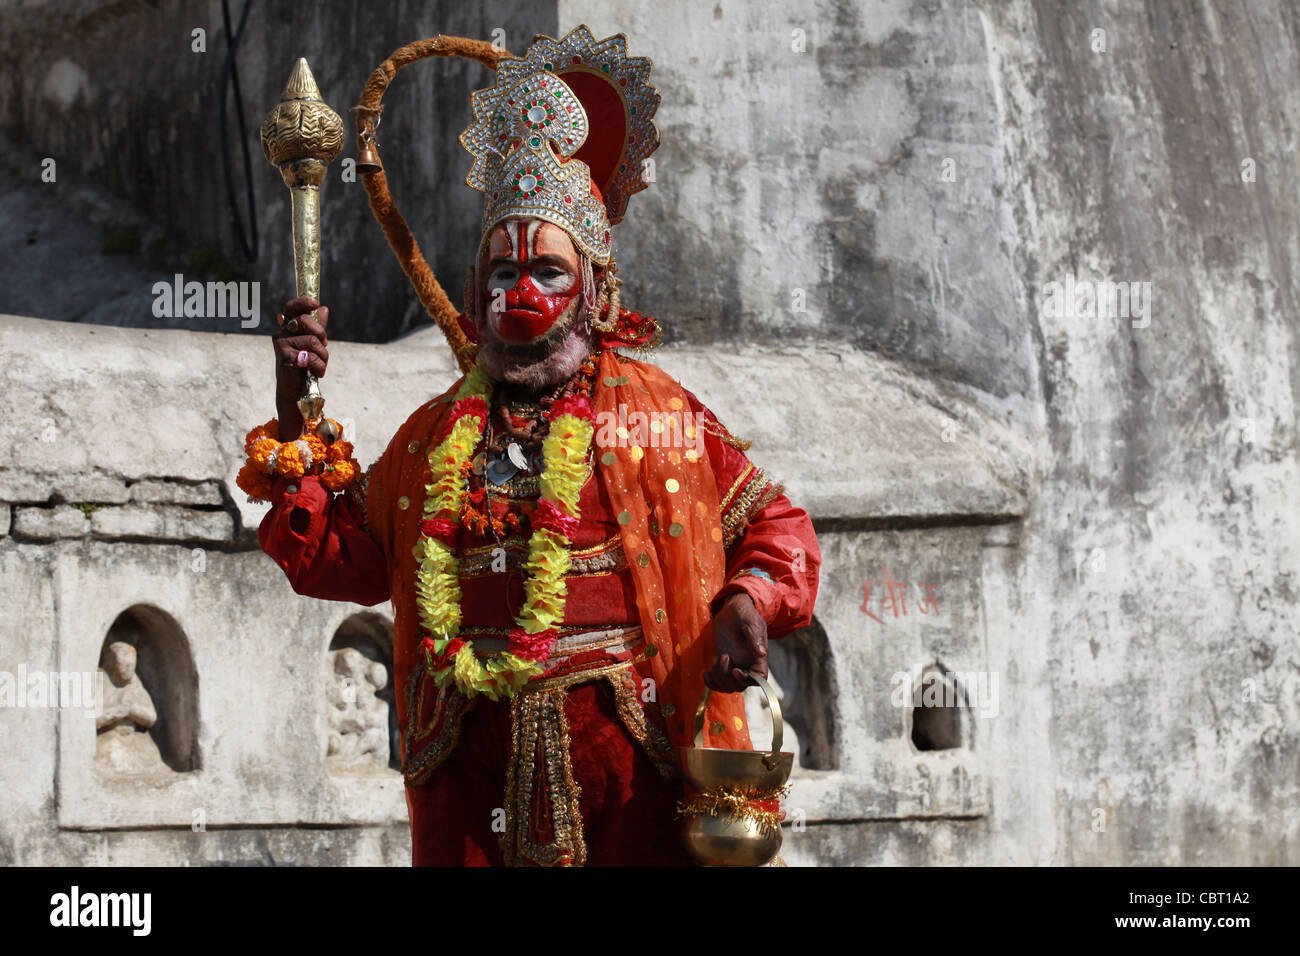 Hannuman Hindu god at Pashupatinath, Kathmandhu - Stock Image